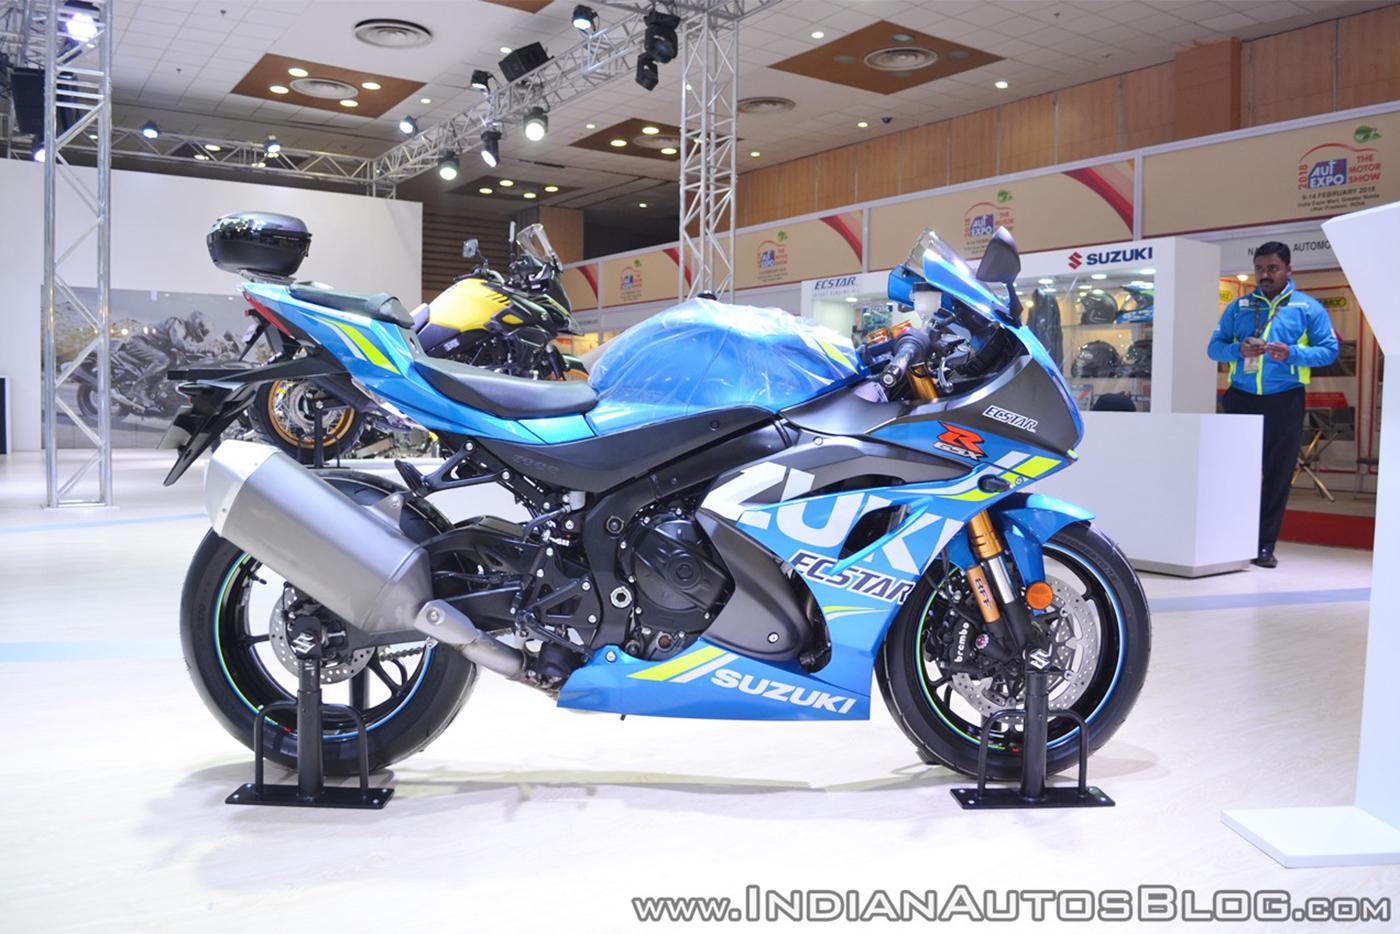 2018-suzuki-gsx-r1000r-blue-right-side-at-2018-auto-expo.jpg